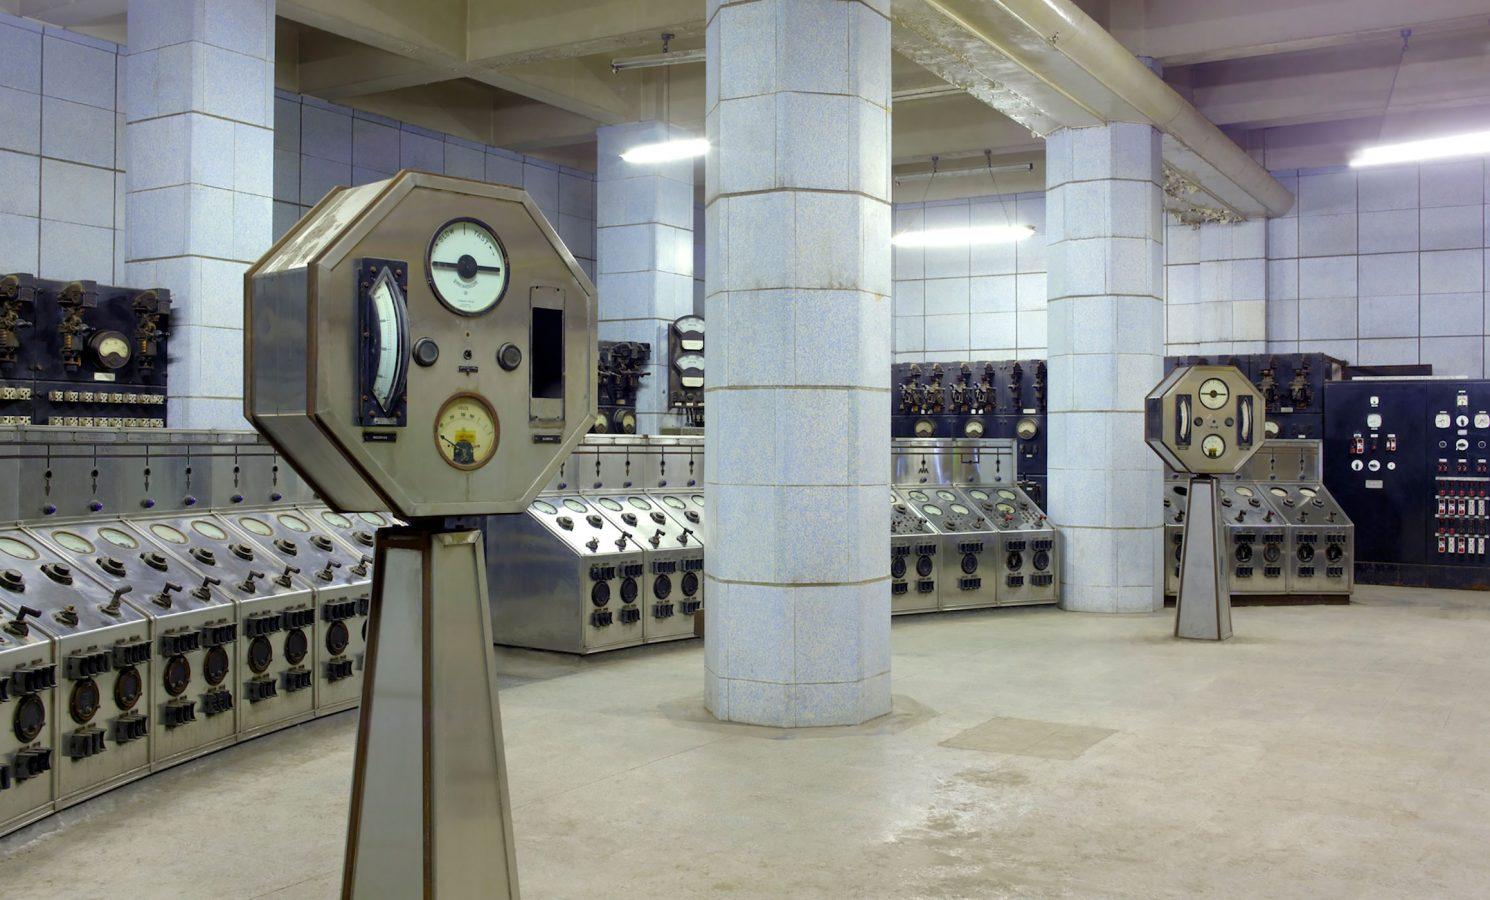 Battersea Power Station Control Room B Side